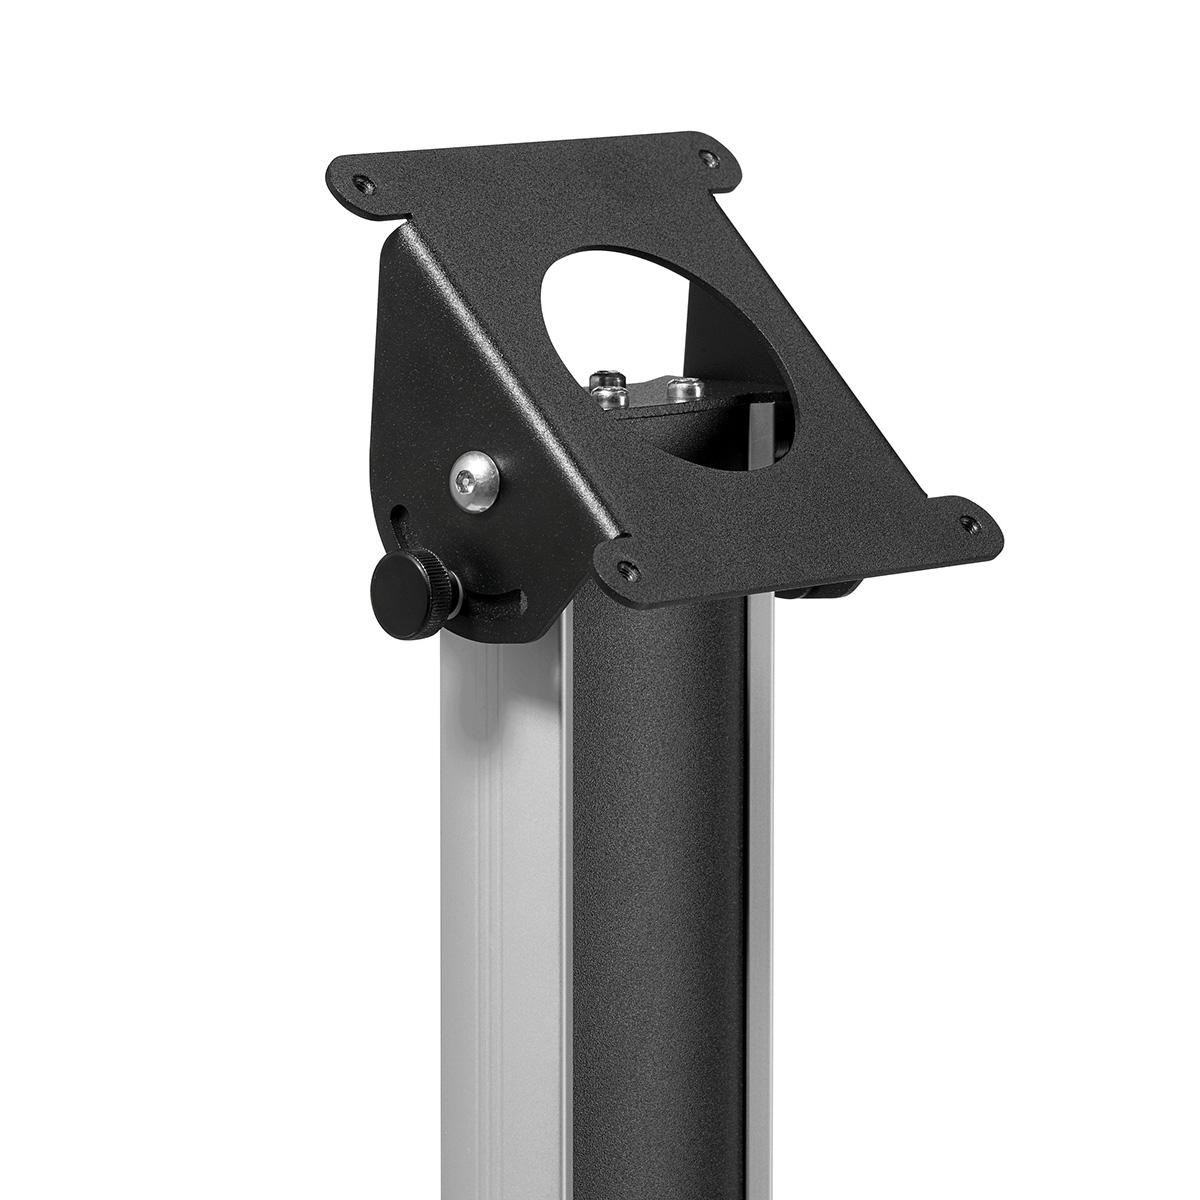 Vogels PTA 3005B - Напольная стационарная стойка для защитных кожухов TabLock, макс. нагрузка 3 кг, черная